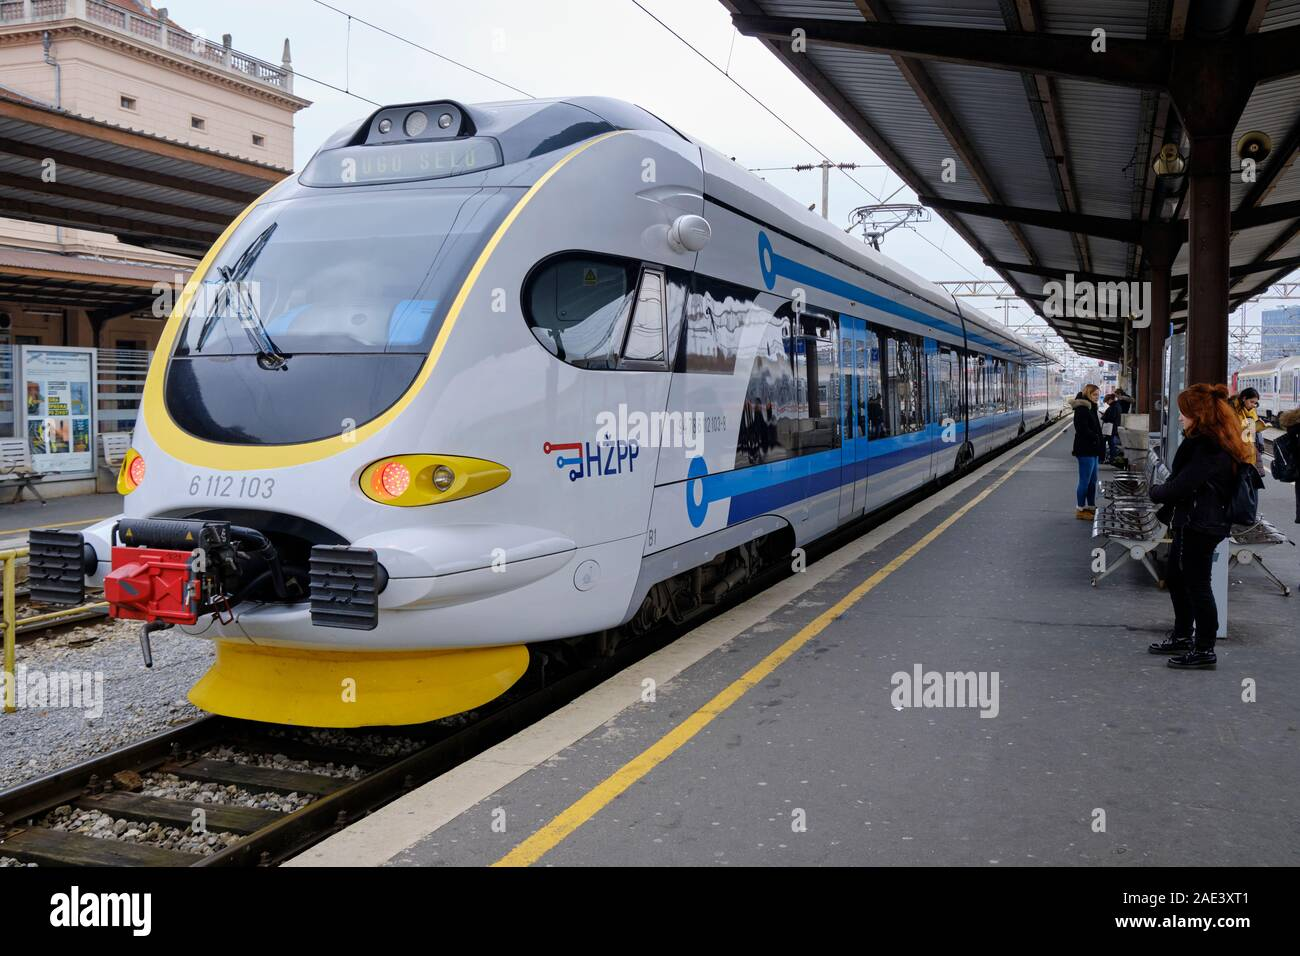 hz-series-6112-emu-train-at-platform-in-zagreb-station-zagreb-croatia-2AE3XT1.jpg